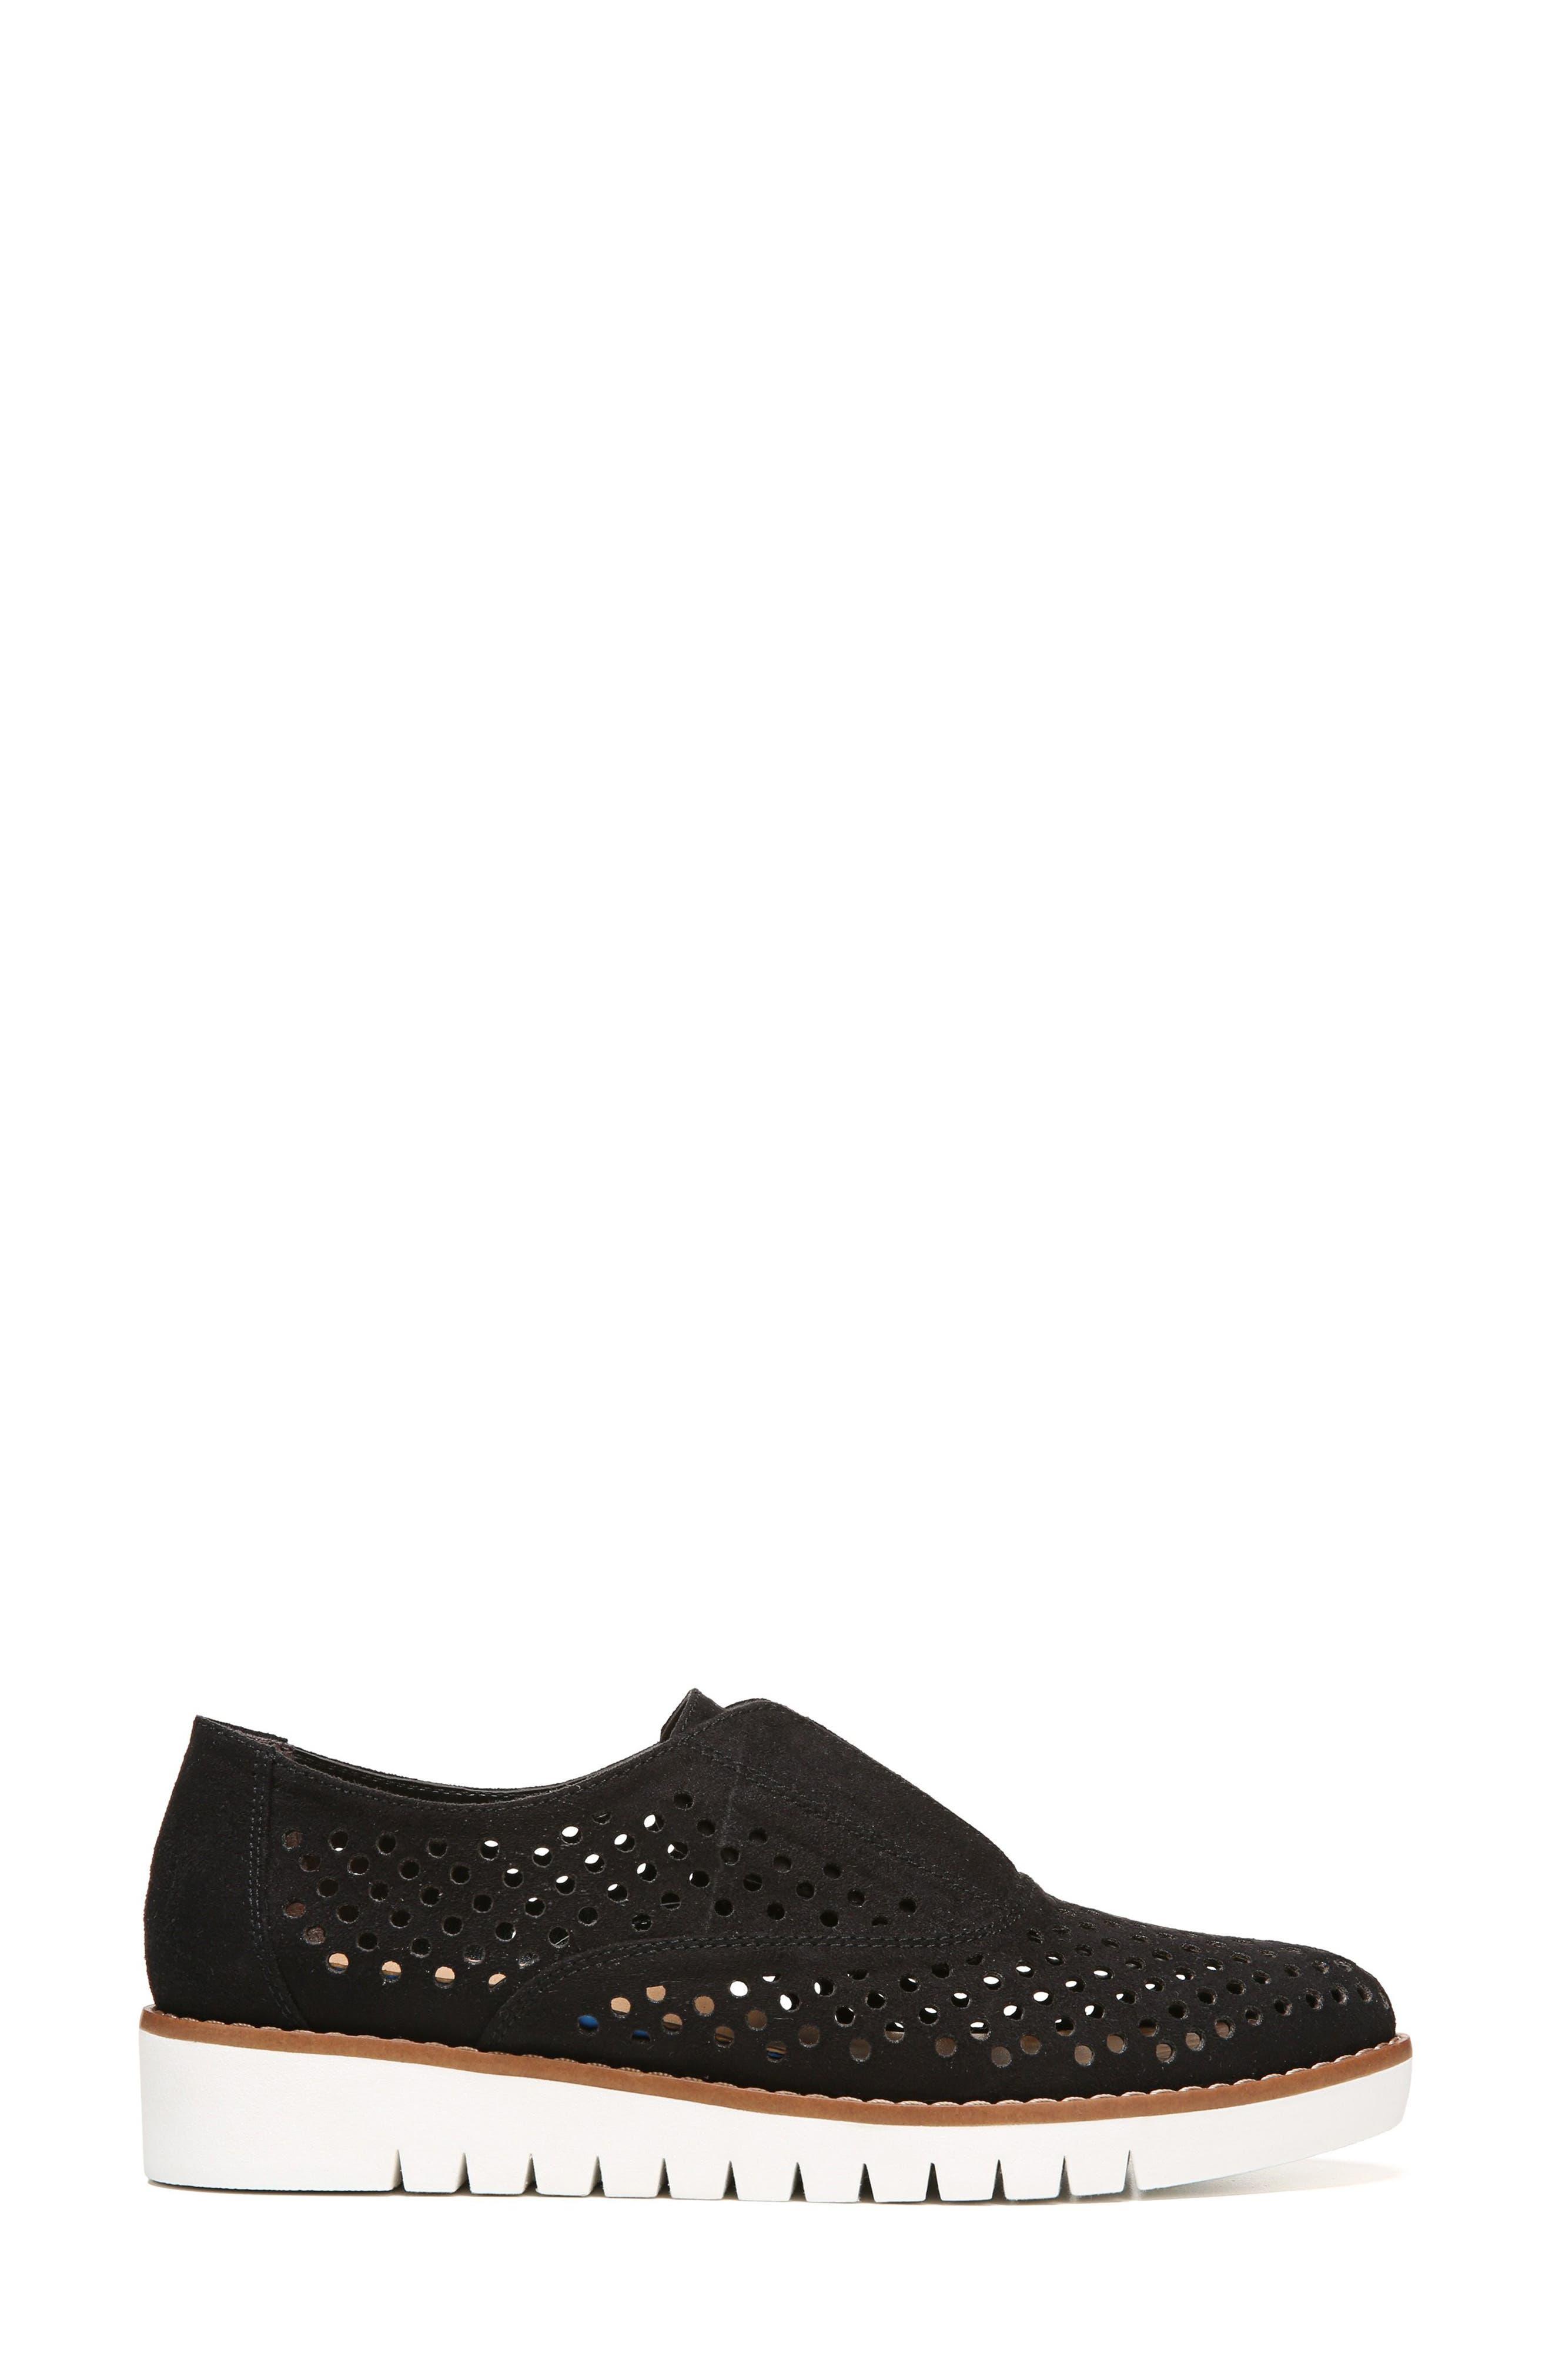 Improve Slip-On Sneaker,                             Alternate thumbnail 3, color,                             Black Fabric